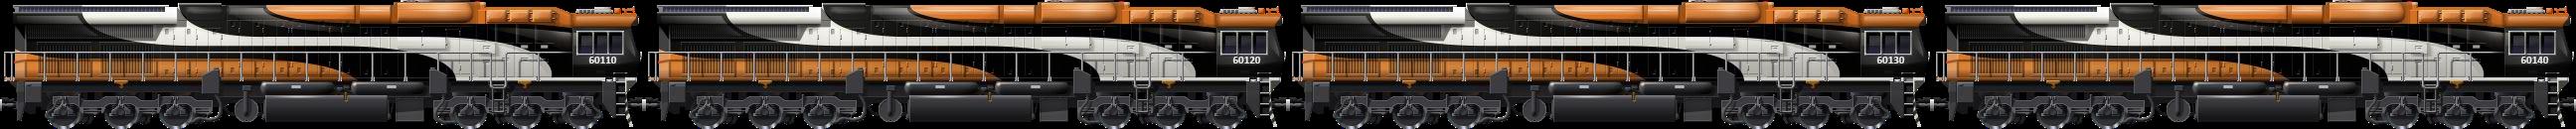 Arjuna Cargo I